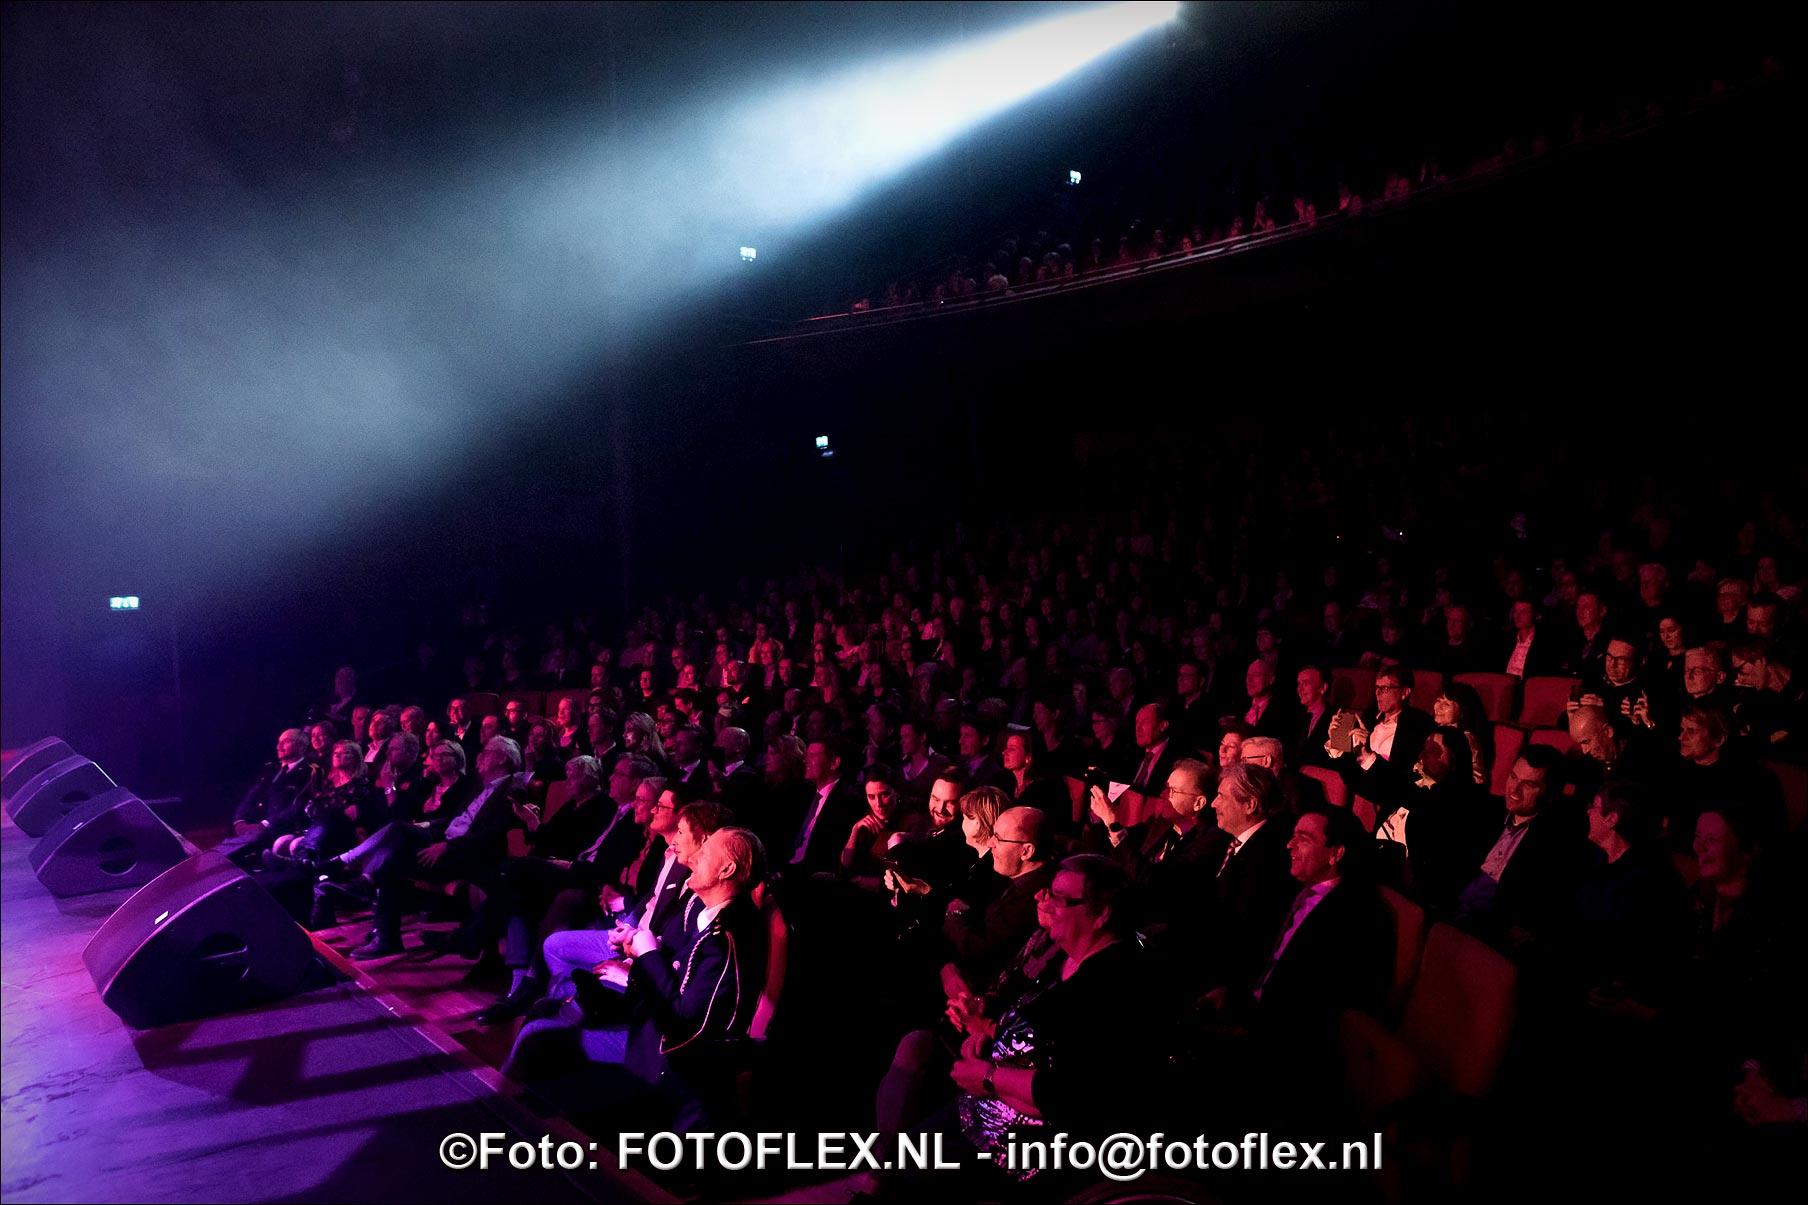 0288-CopyrightFOTOFLEX.NL07012020